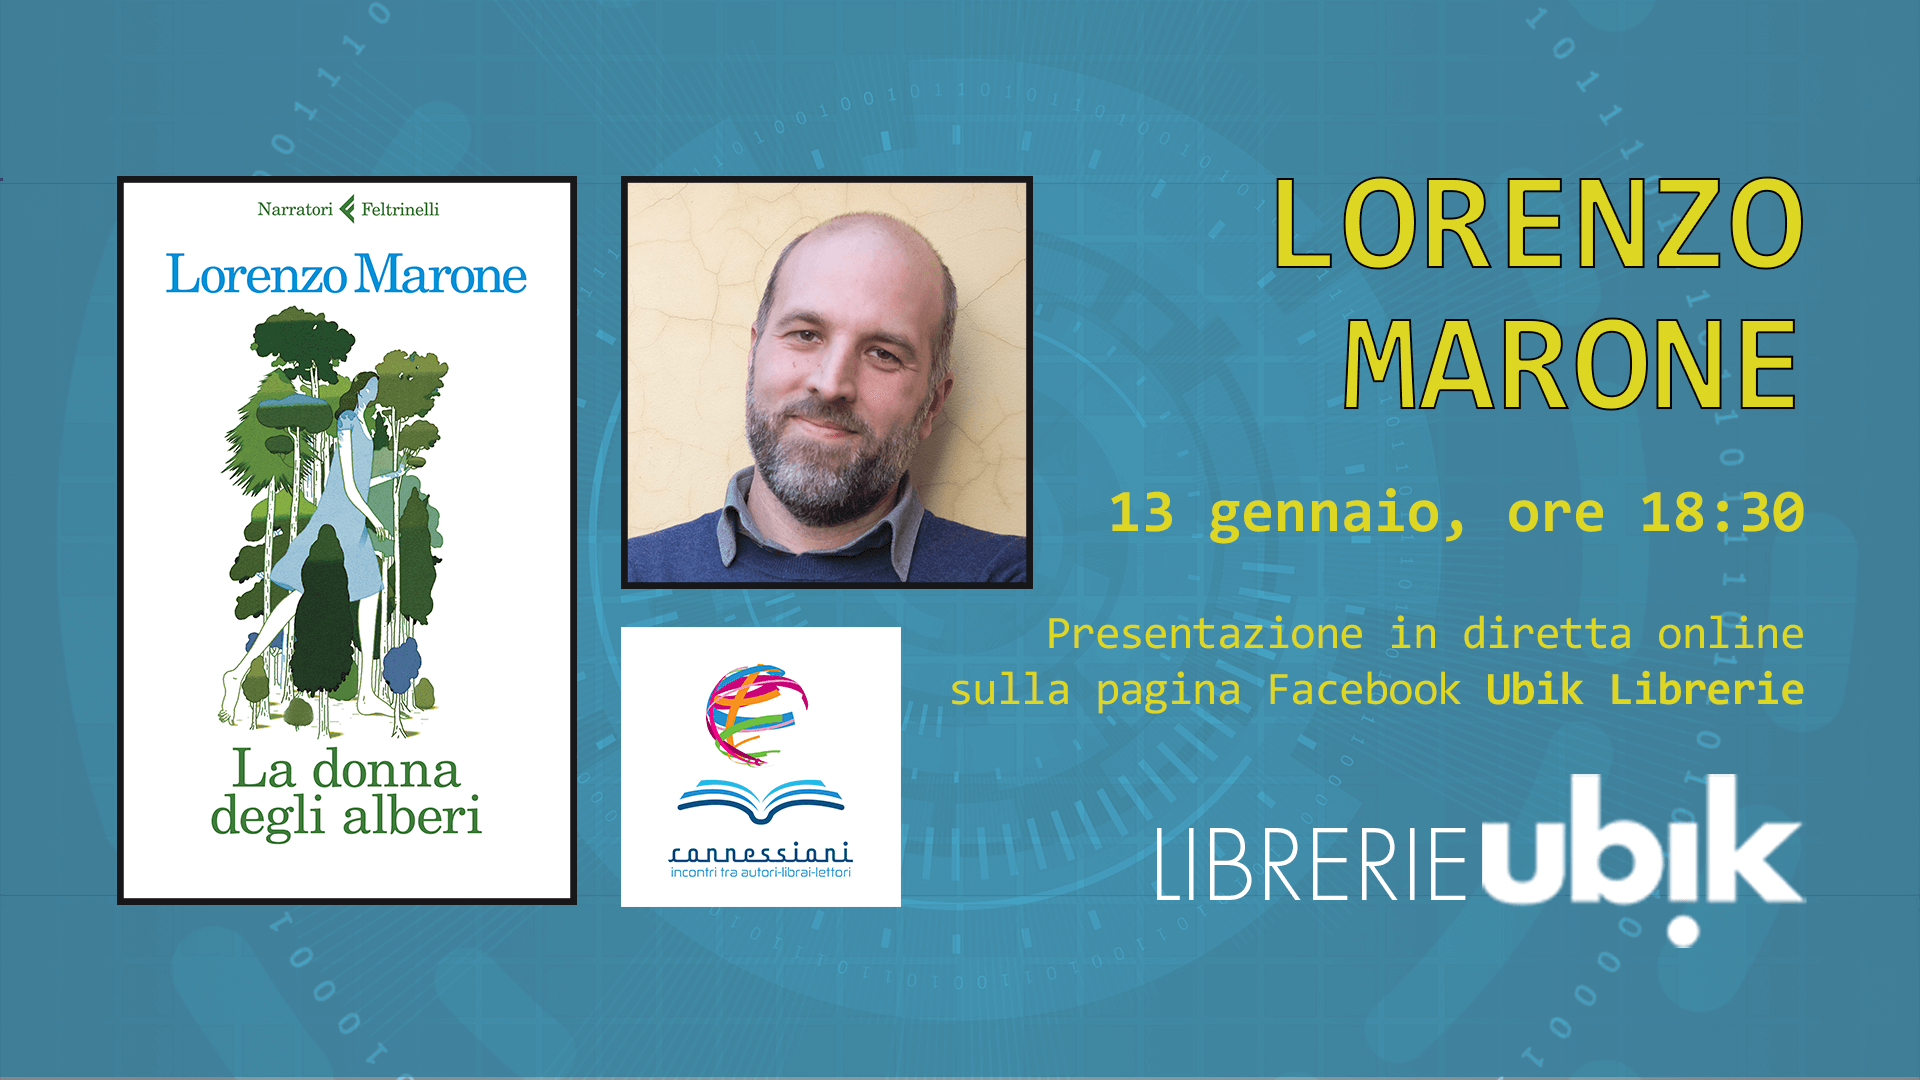 LORENZO MARONE presenta in diretta online